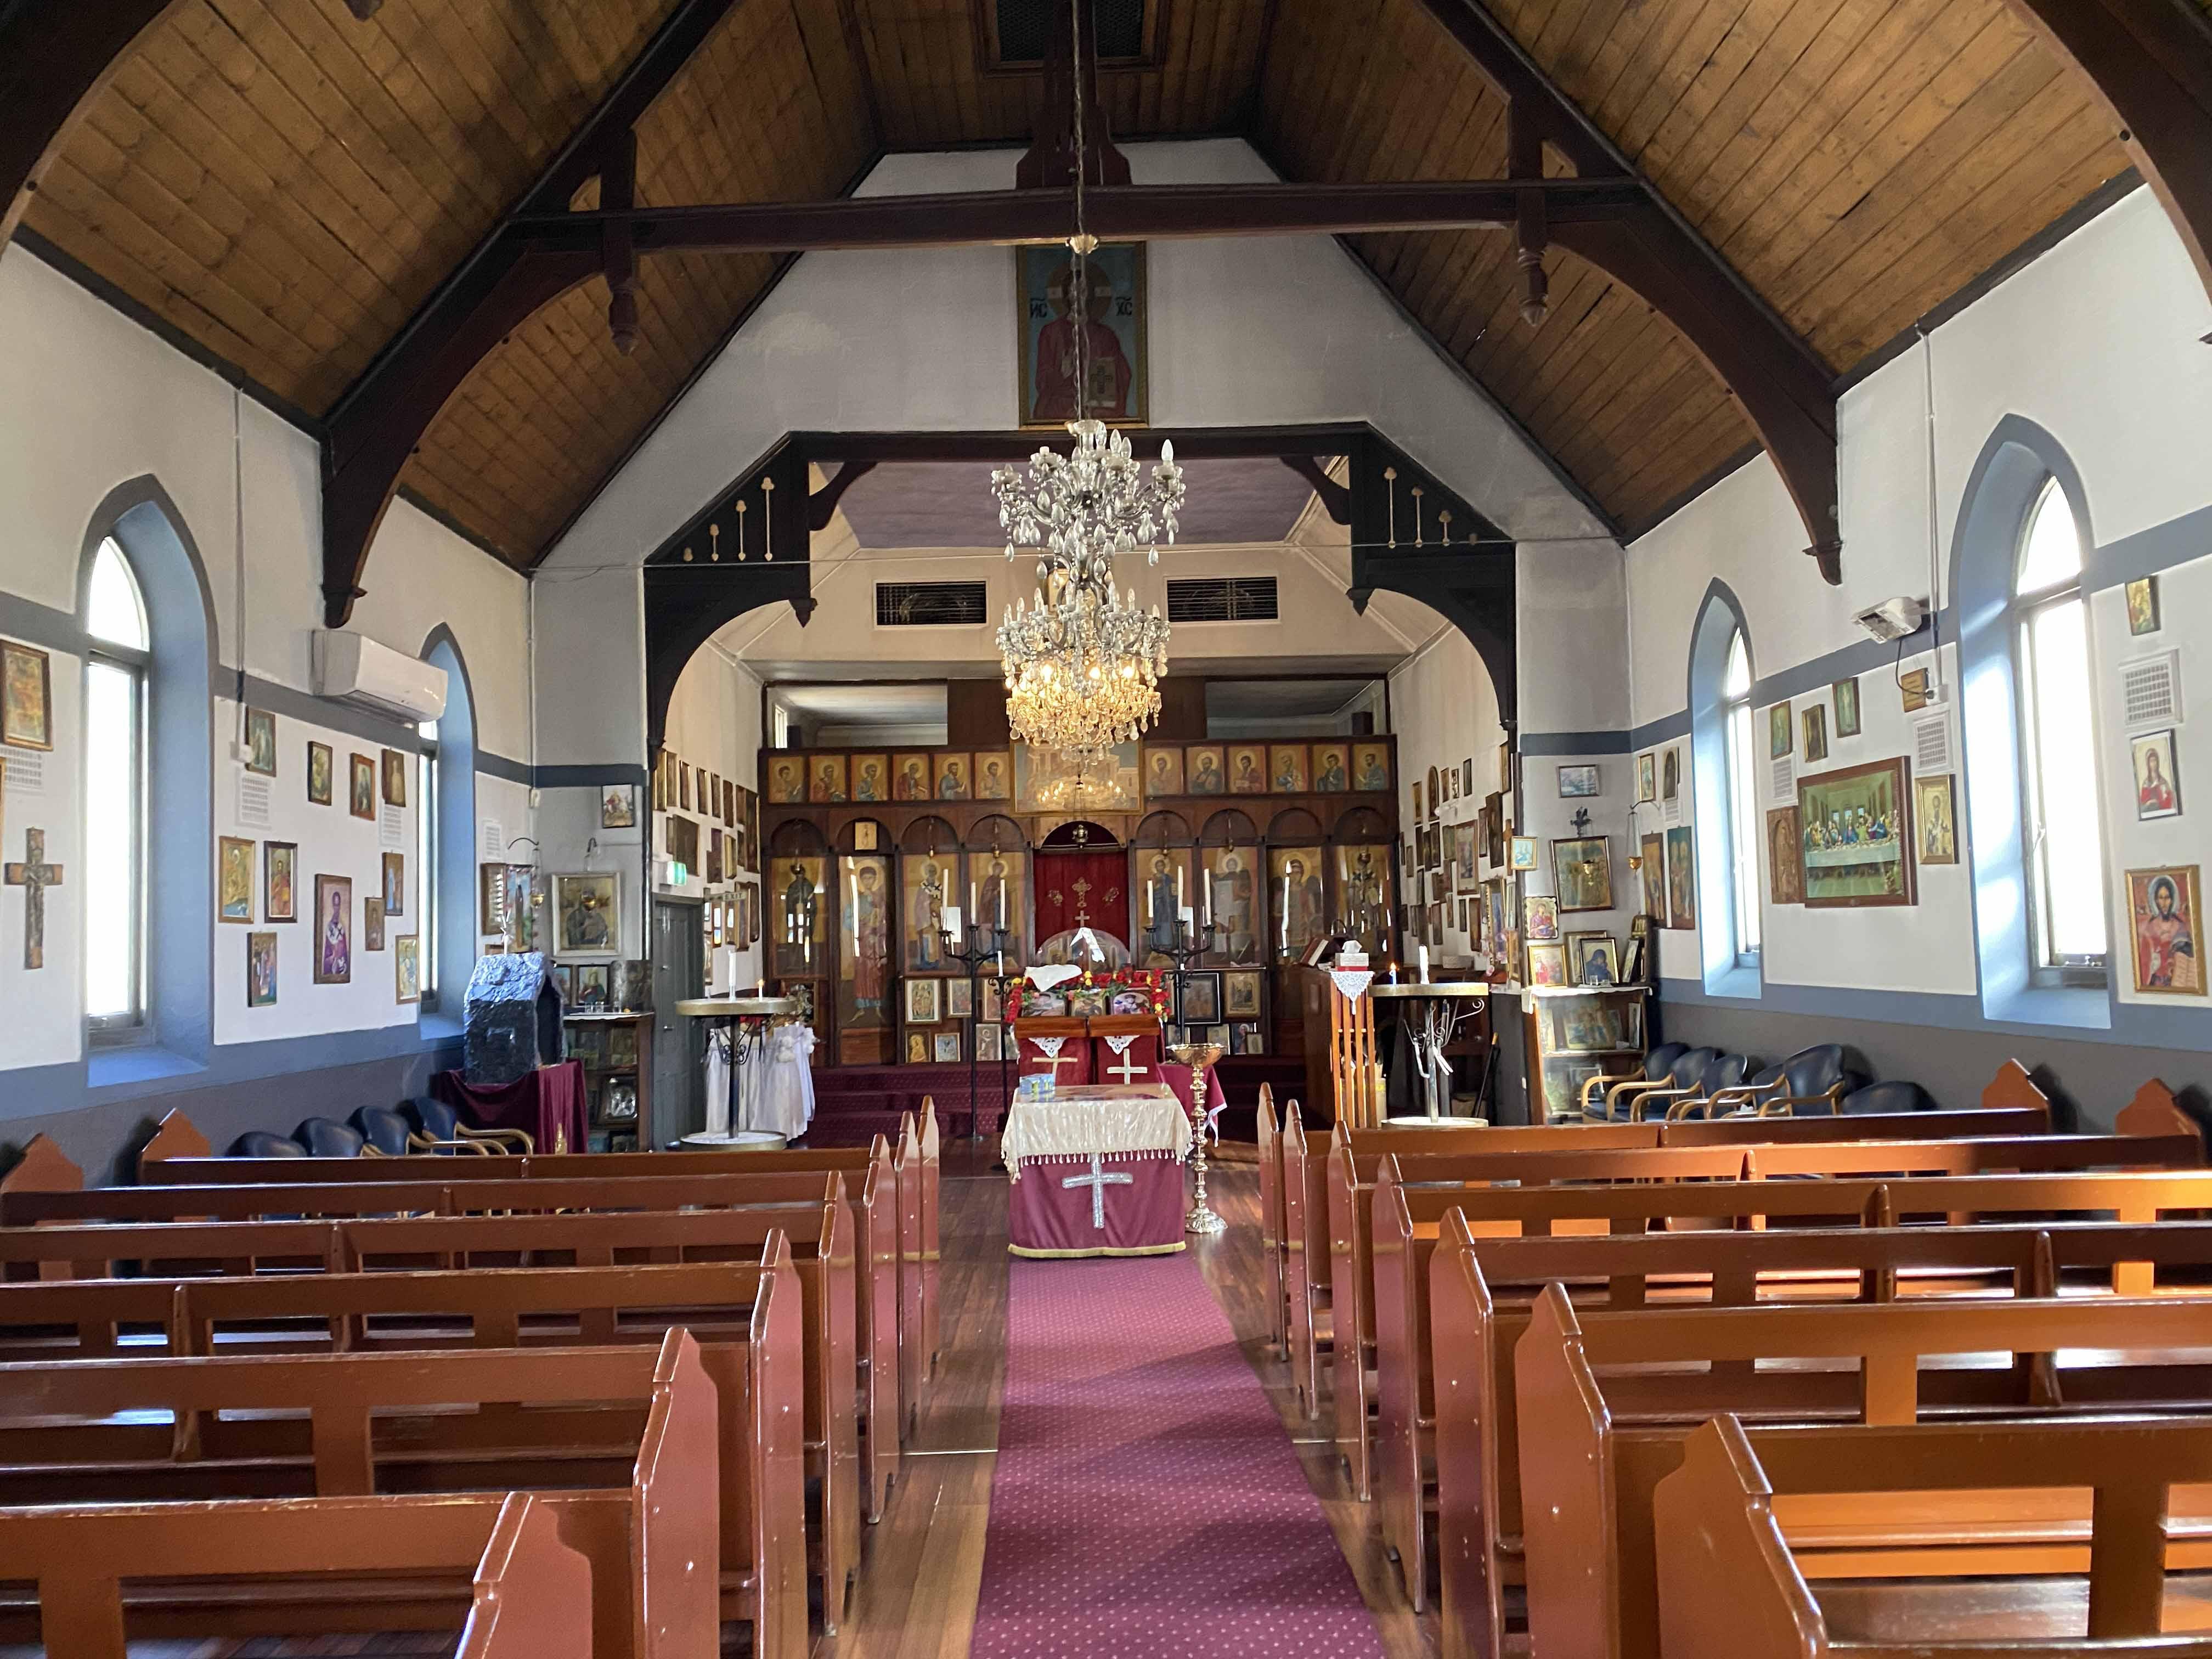 47. St Nikolas North Perth, 2020